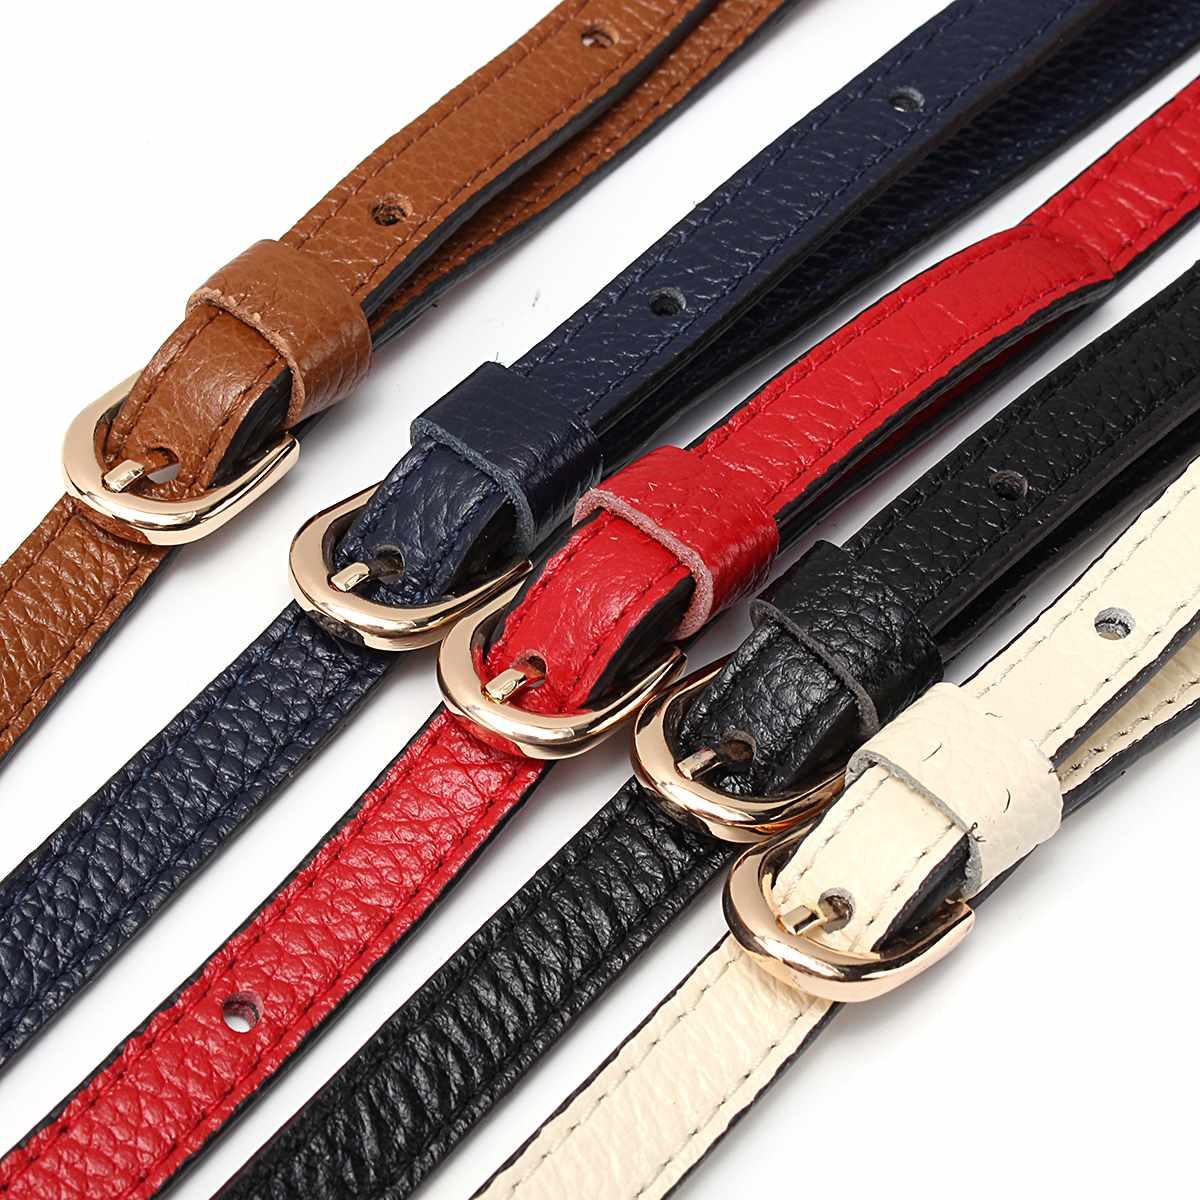 Cow Leather Diy Bag Straps Replacement Shoulder Belts Adjule Strap Belt For Long Handbag Accessories Parts In